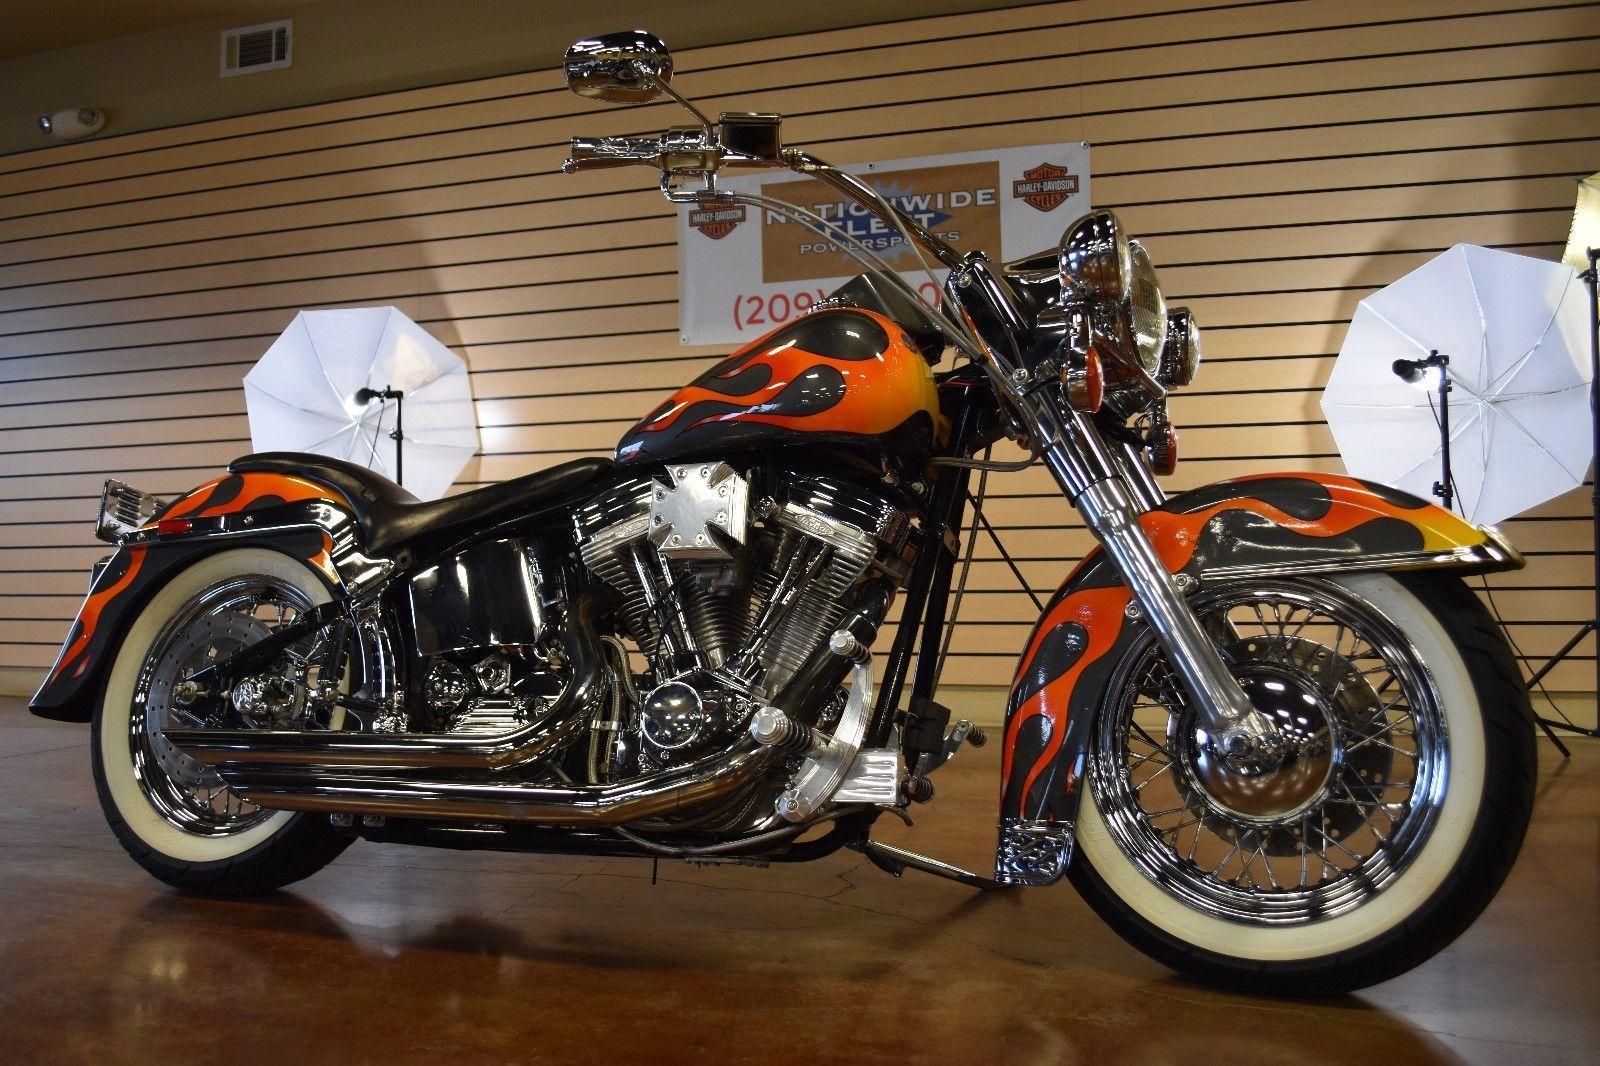 eBay: 2004 Harley-Davidson Softail 2004 Special Construction Softail